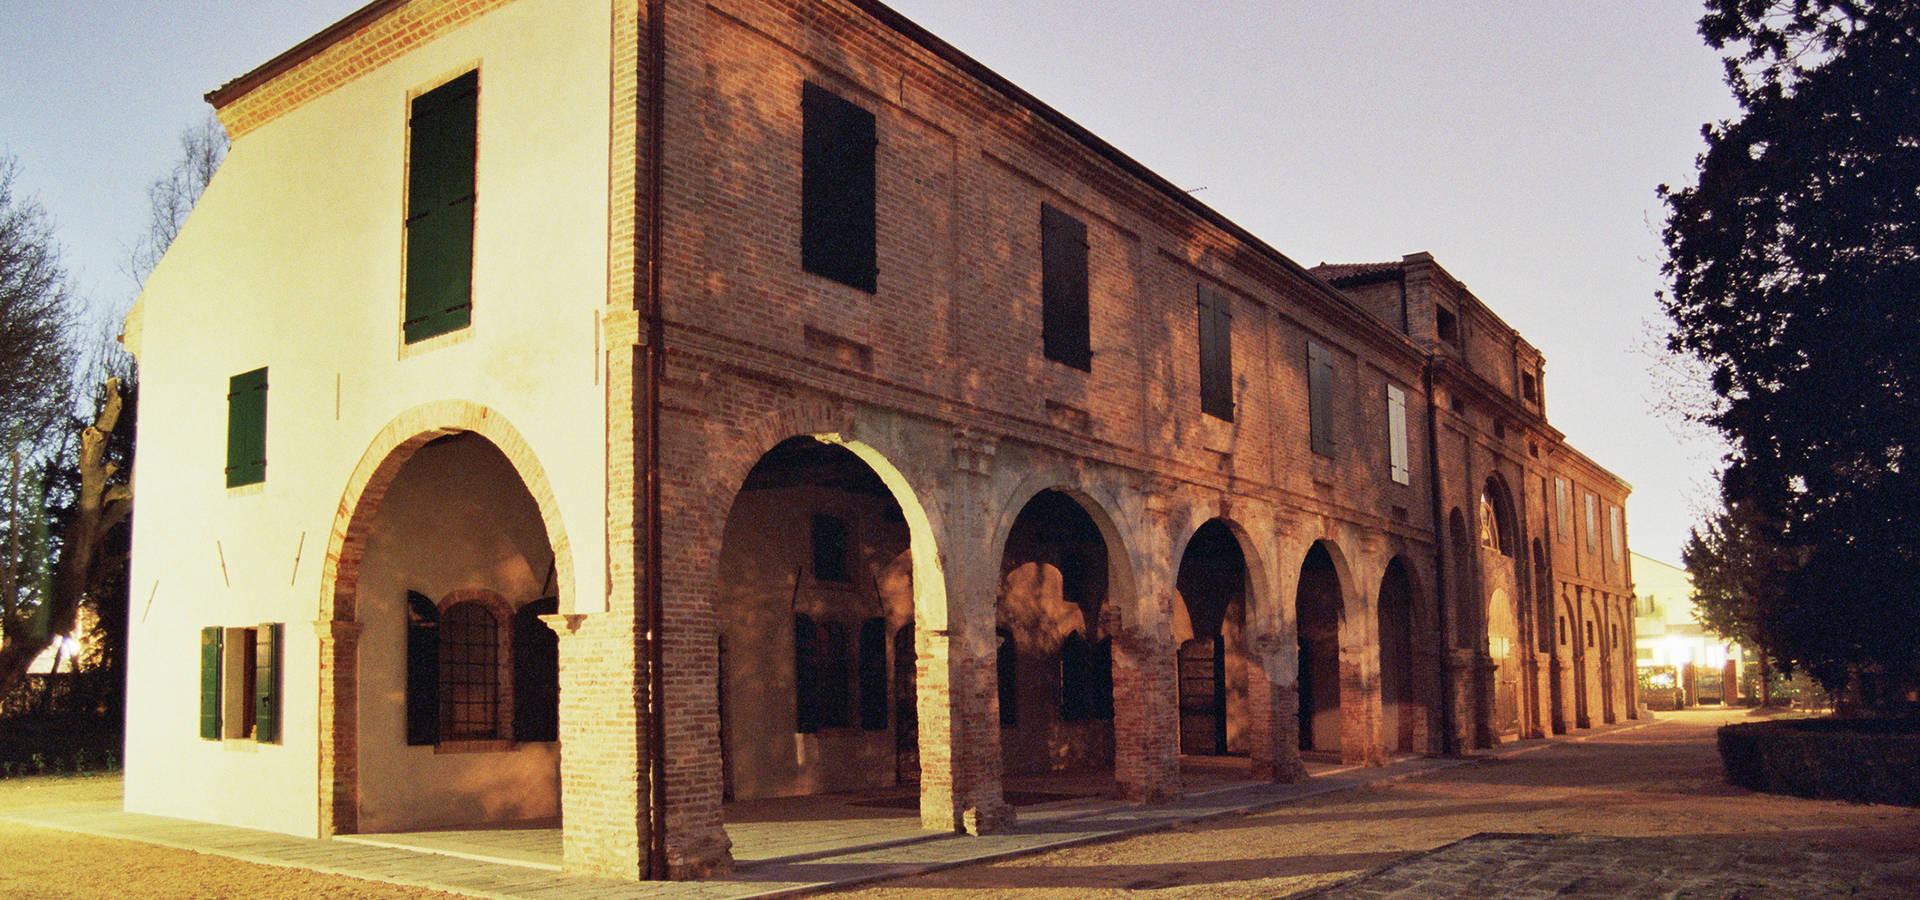 Studio Valle architettura e urbanistica